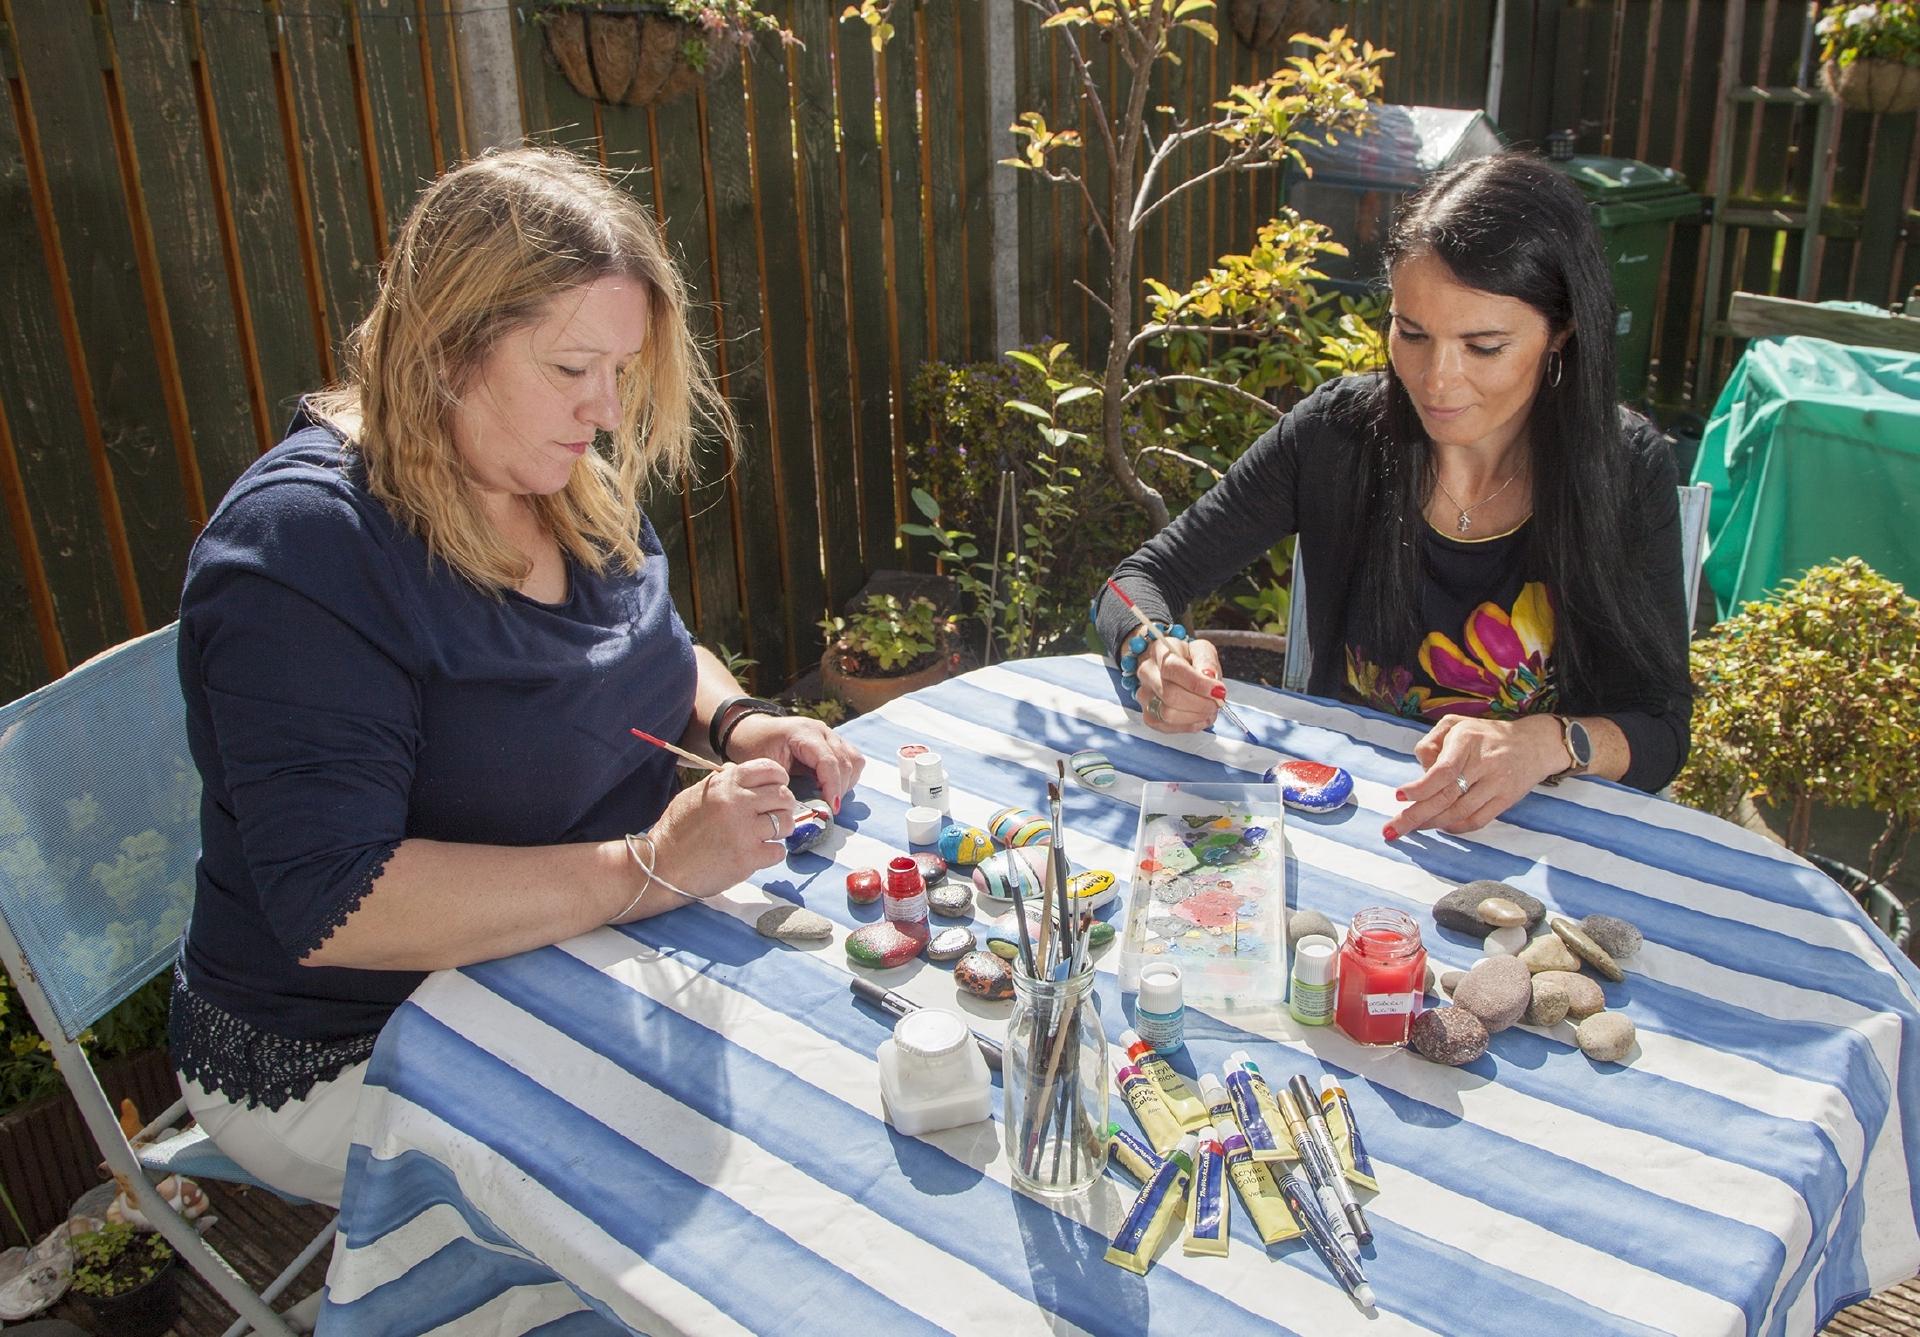 Carnoustie Rocks founder Emma Allan inspires Gayle to paint her own design.